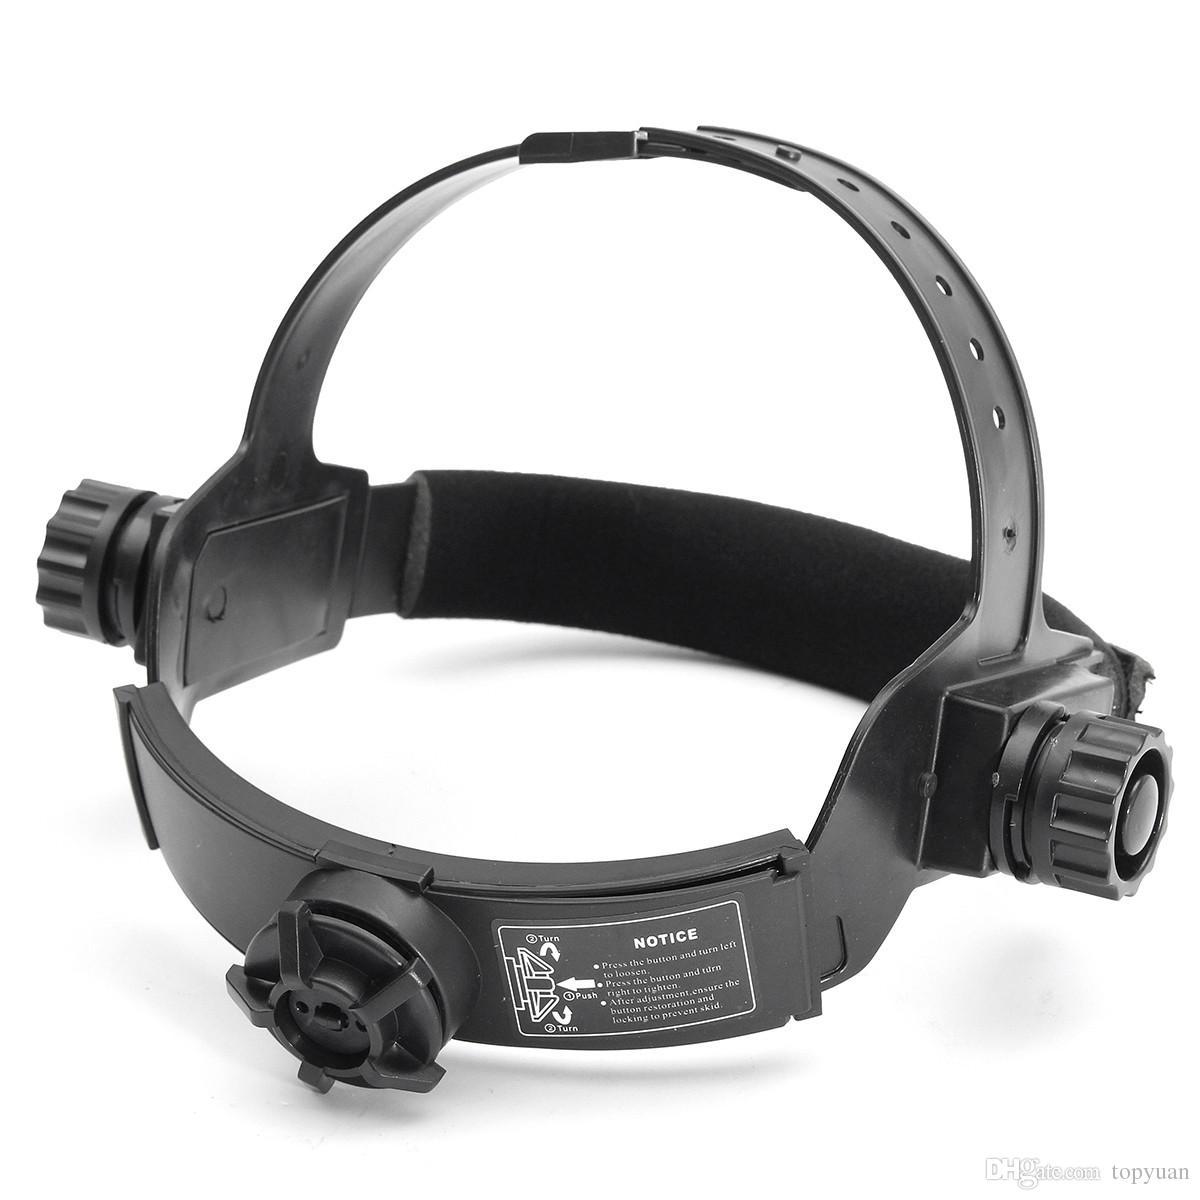 Image result for welding helmet headband